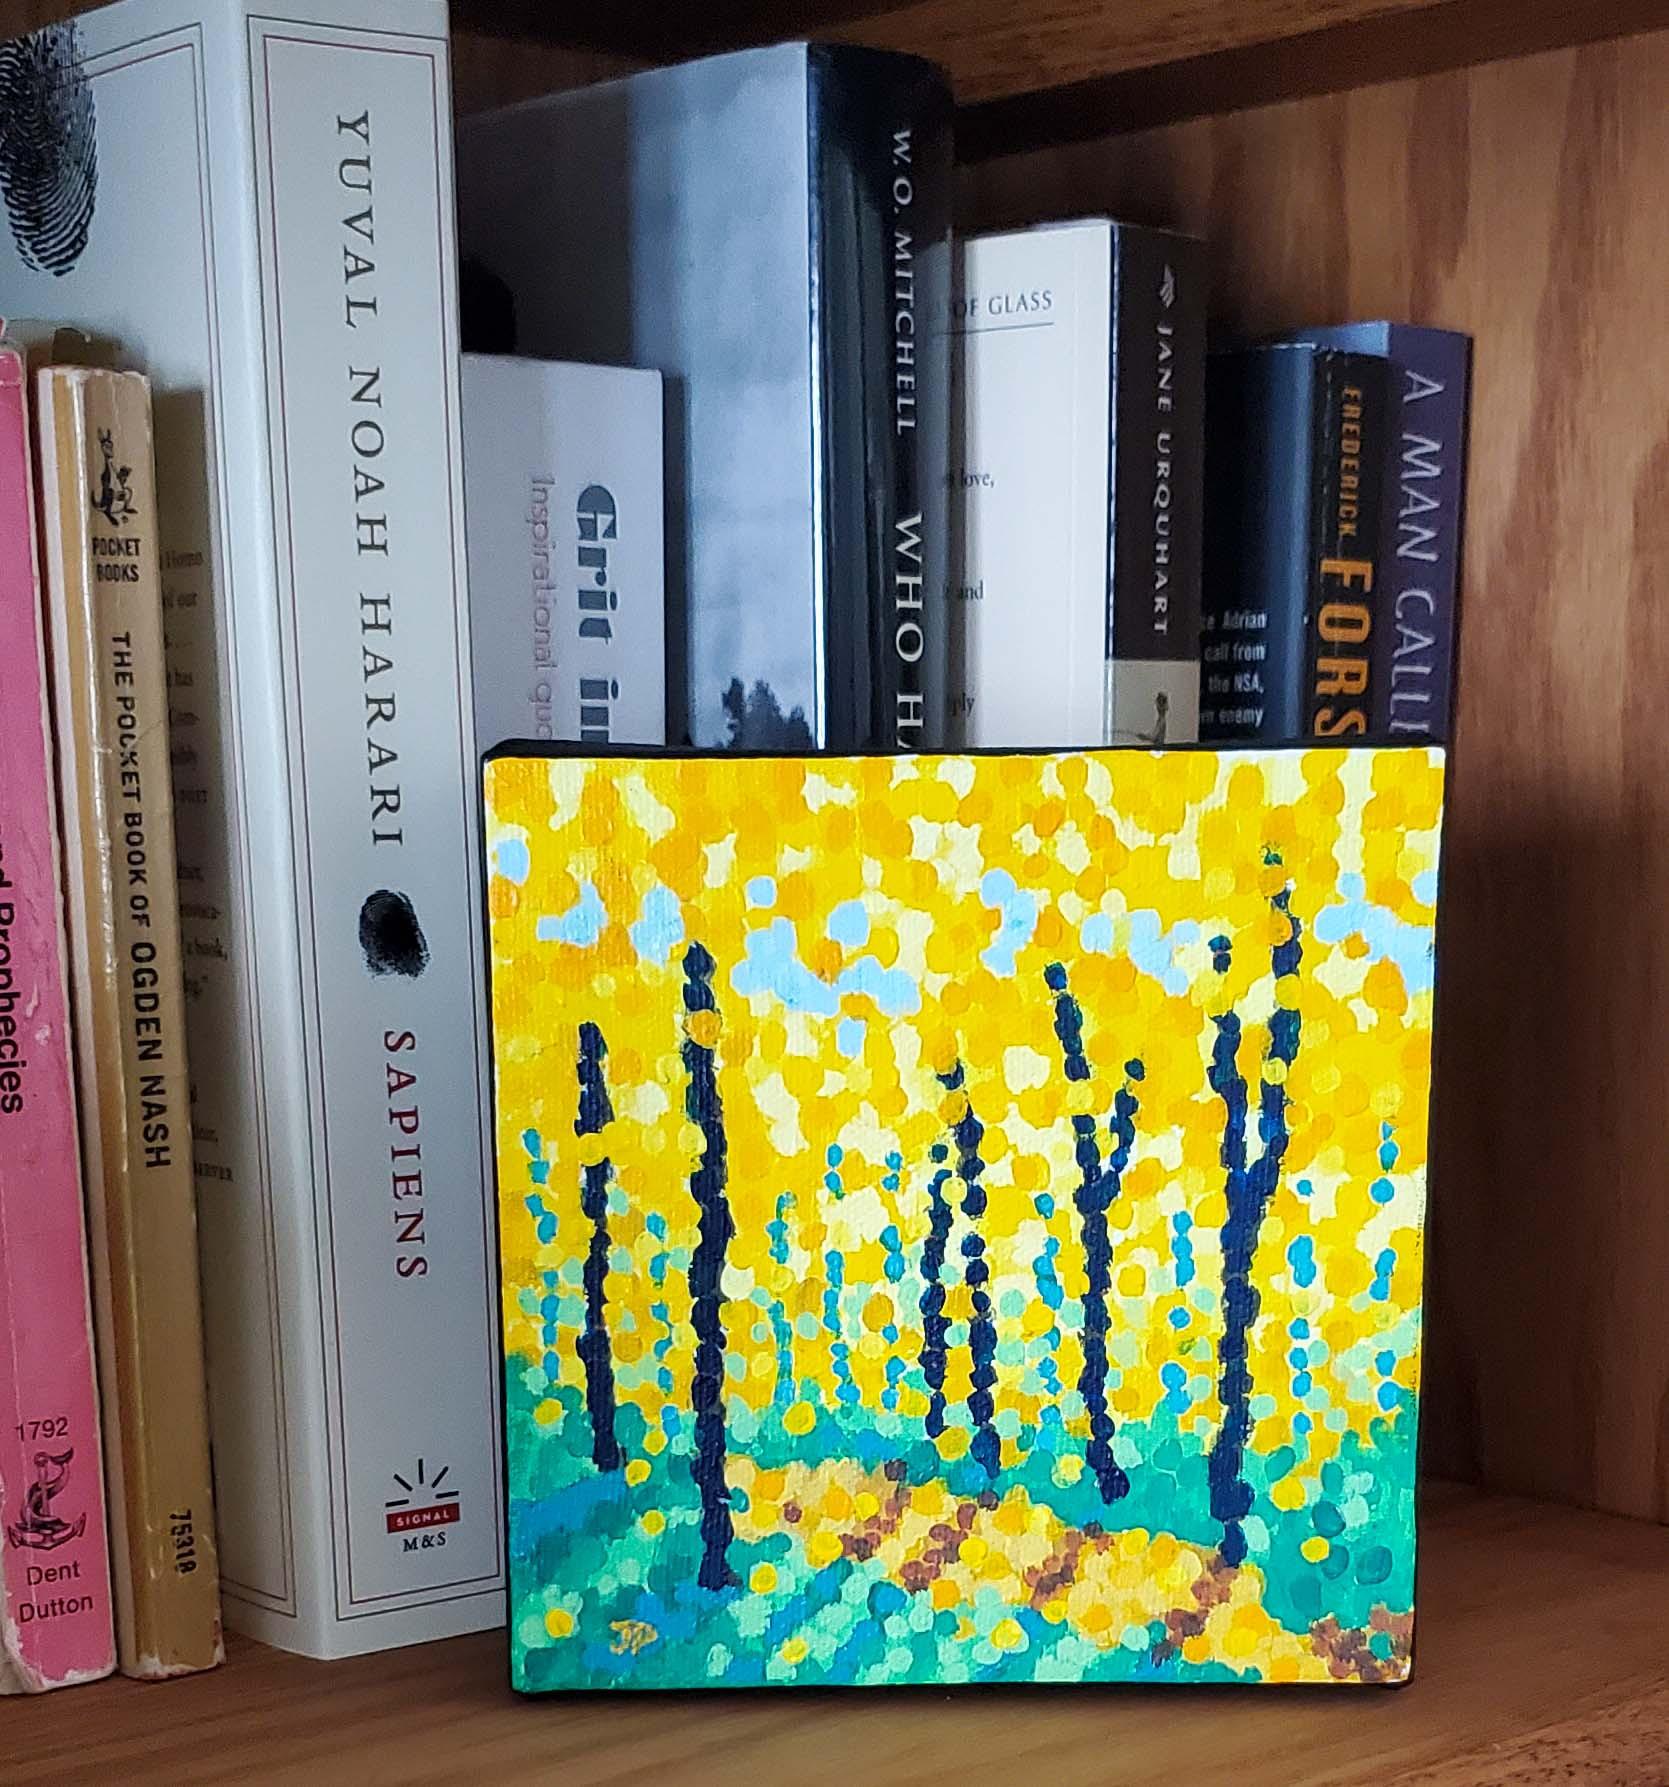 Autumn sunshine bookshelf ufmkok